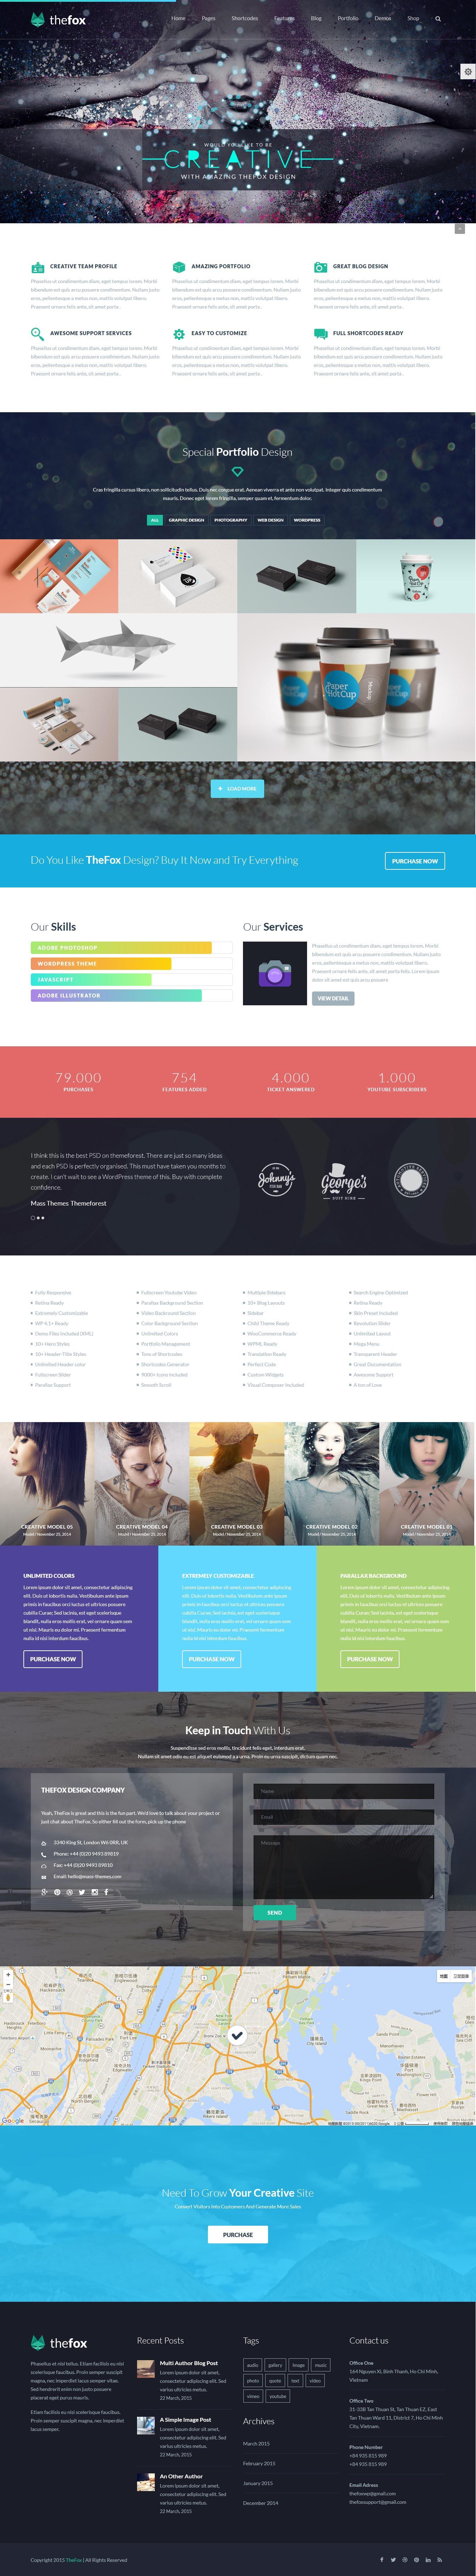 TheFox 多用途企业公司网站WordPress汉化主题 – v3.9.9.16